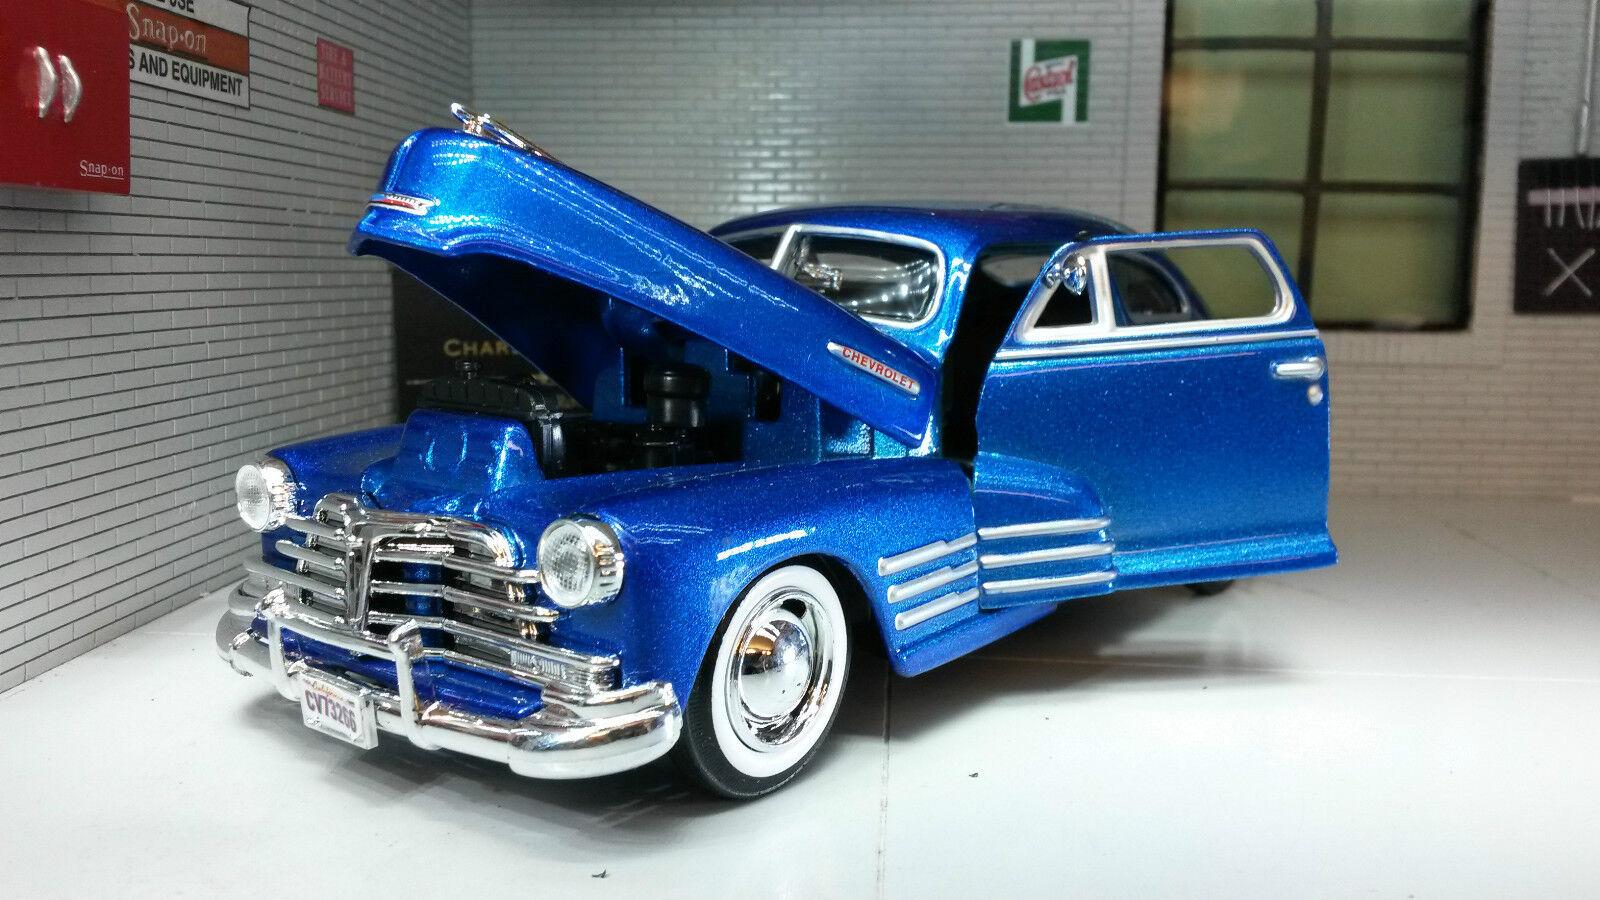 Chevrolet Scala 24 1 Aepinkdan 73266B blue in Modello